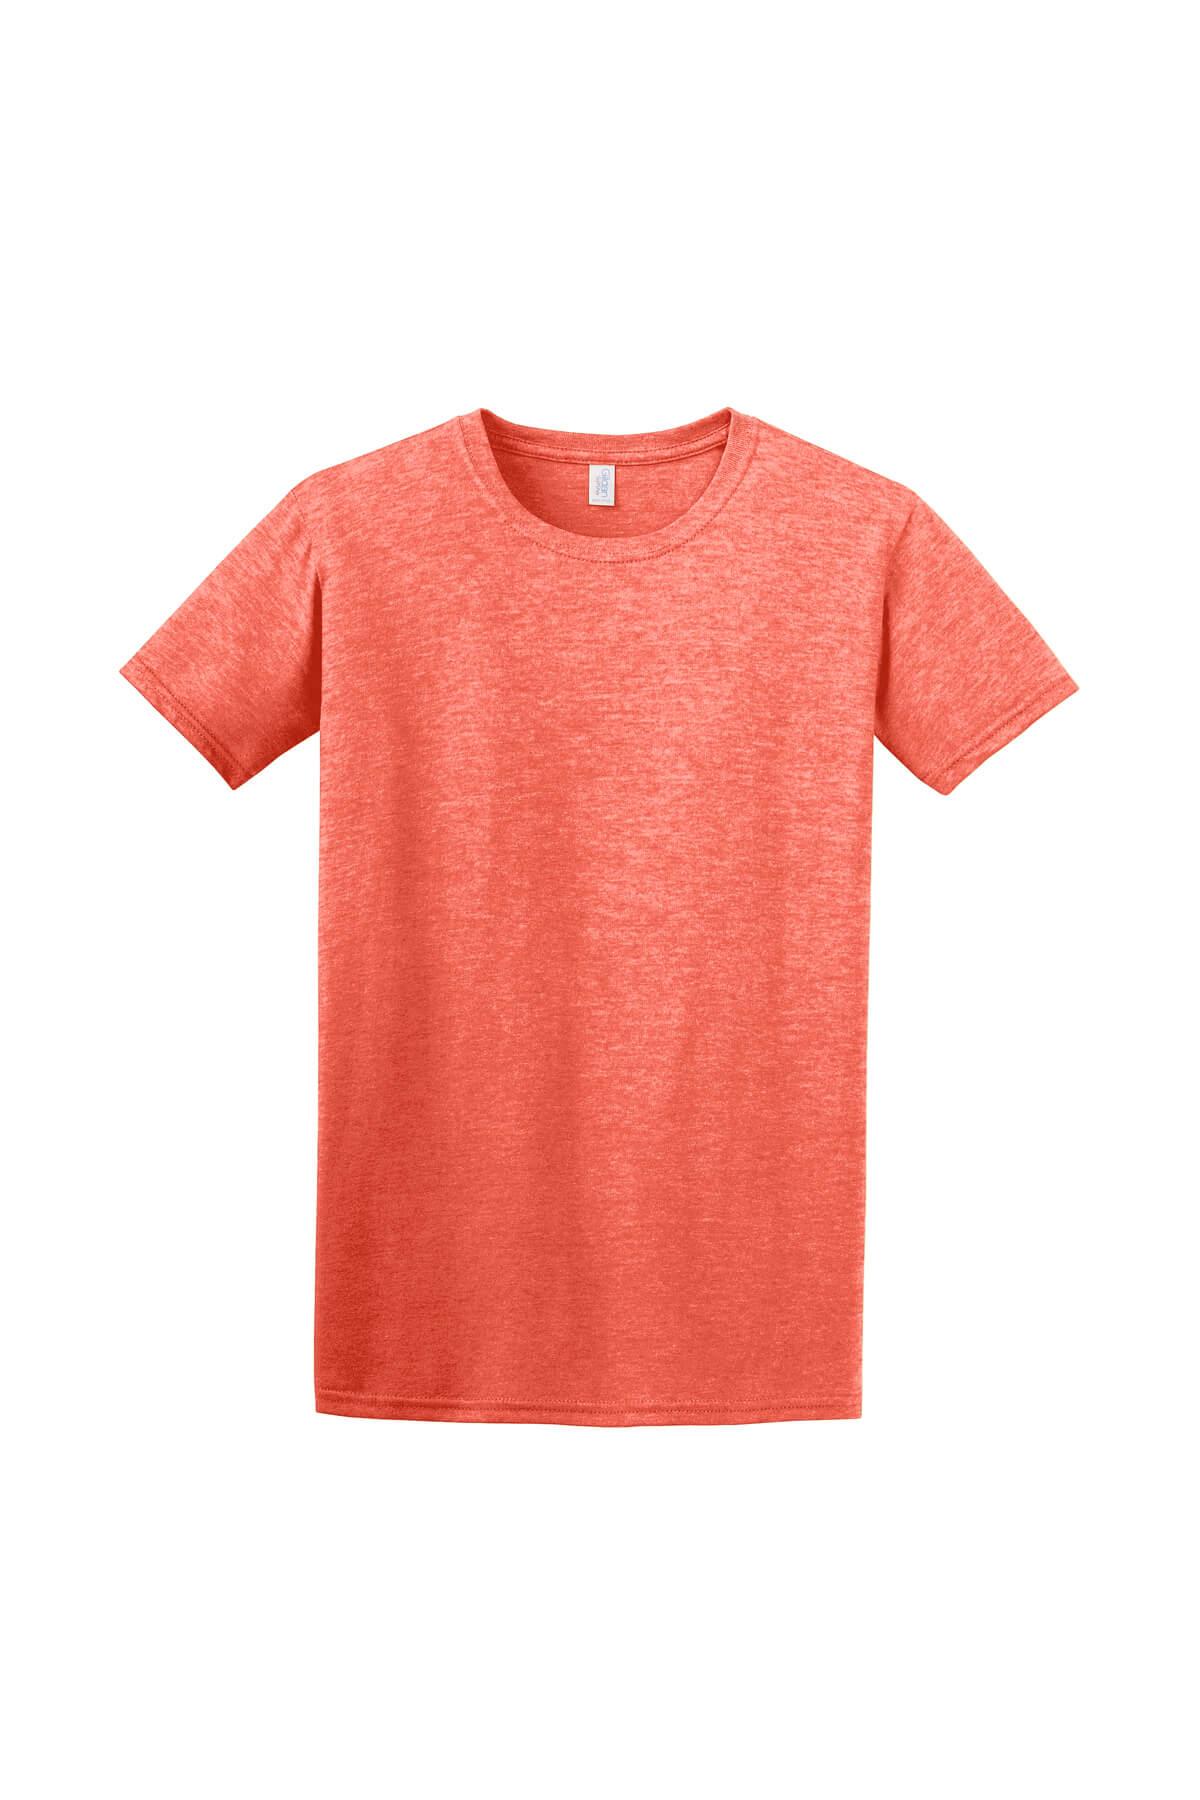 Heather Orange T-Shirt Front